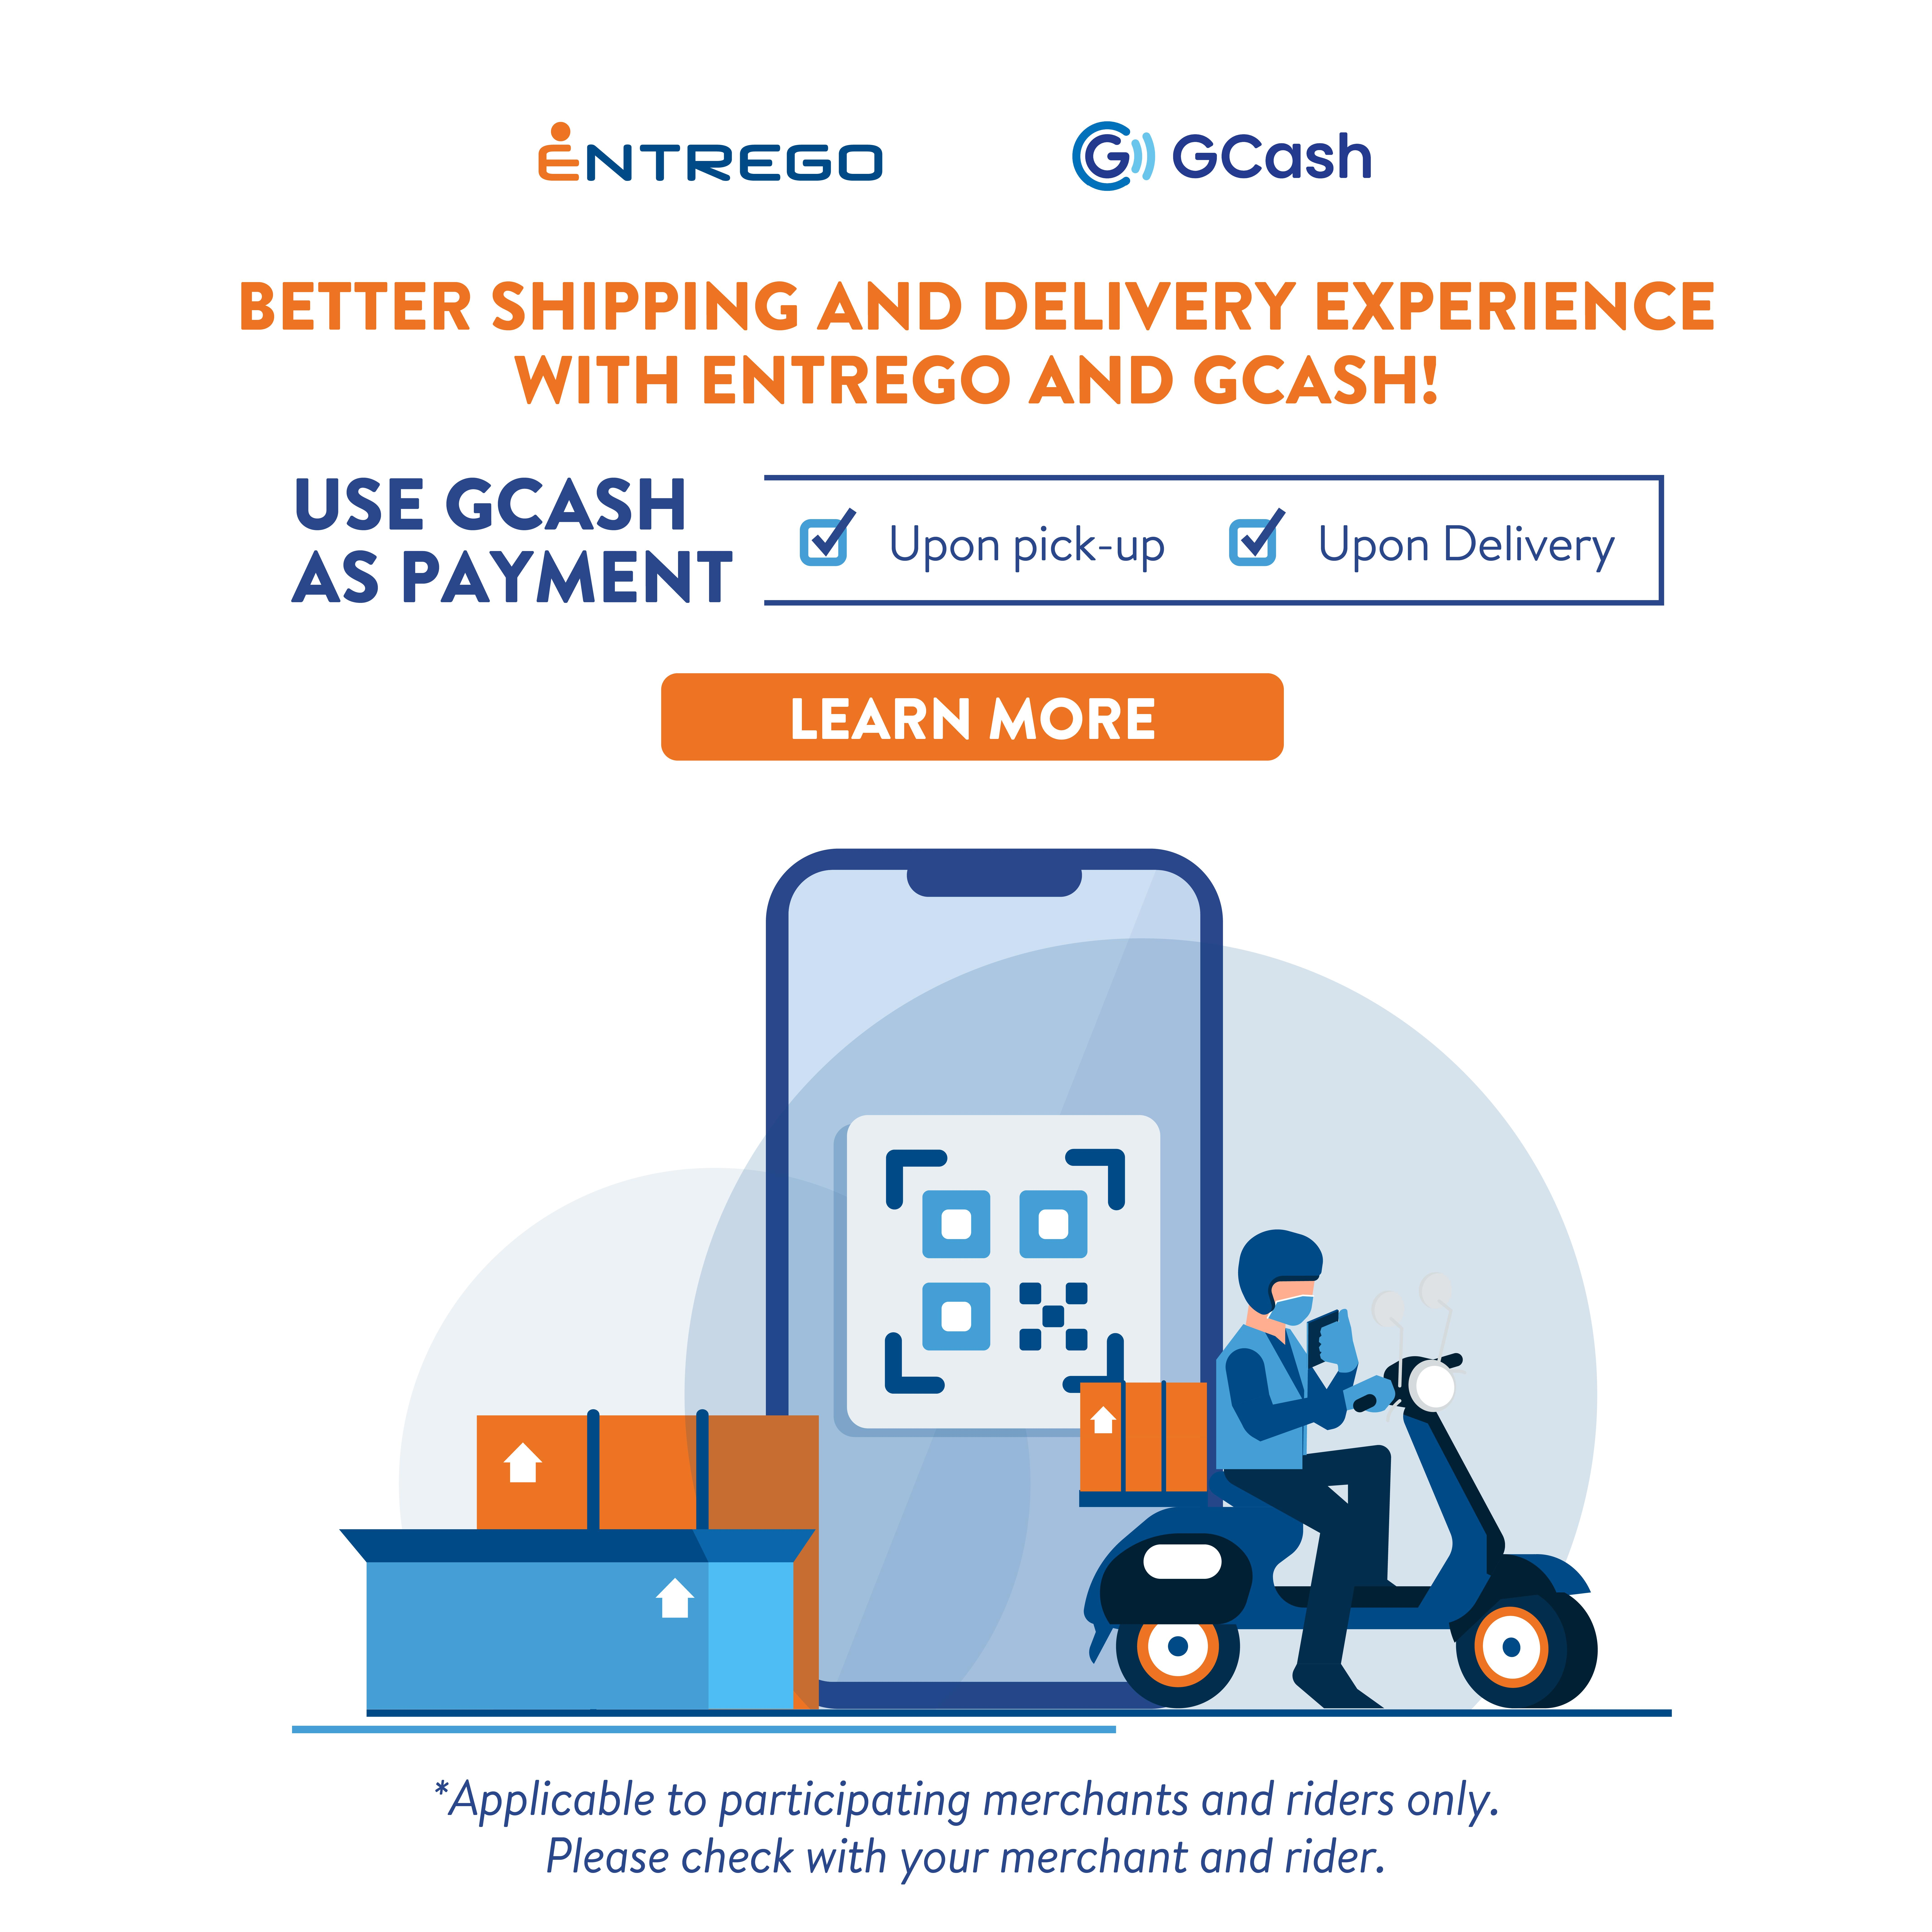 use-gcash-as-payment